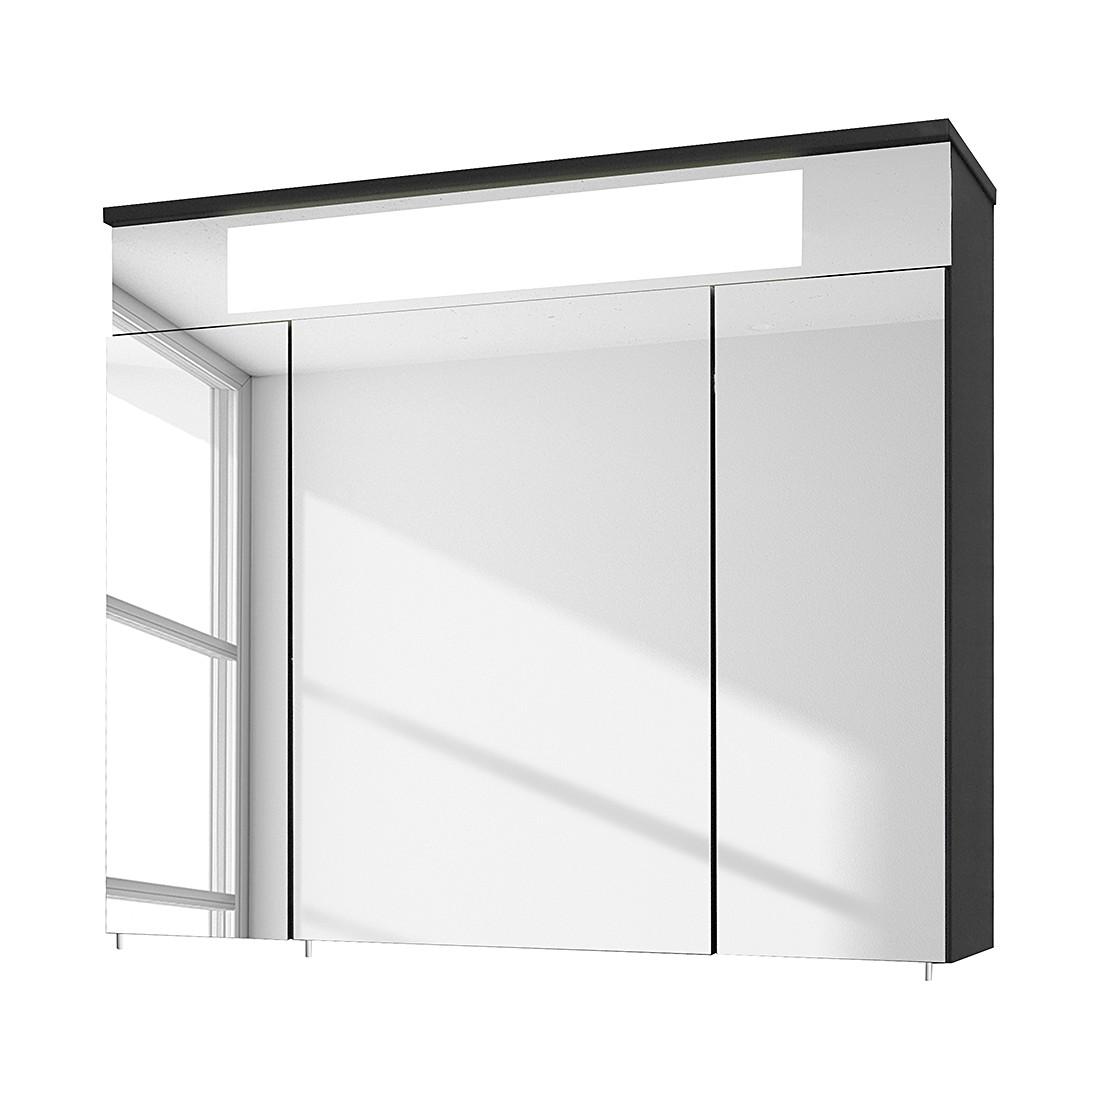 spiegelschr nke f rs bad online kaufen m bel suchmaschine. Black Bedroom Furniture Sets. Home Design Ideas